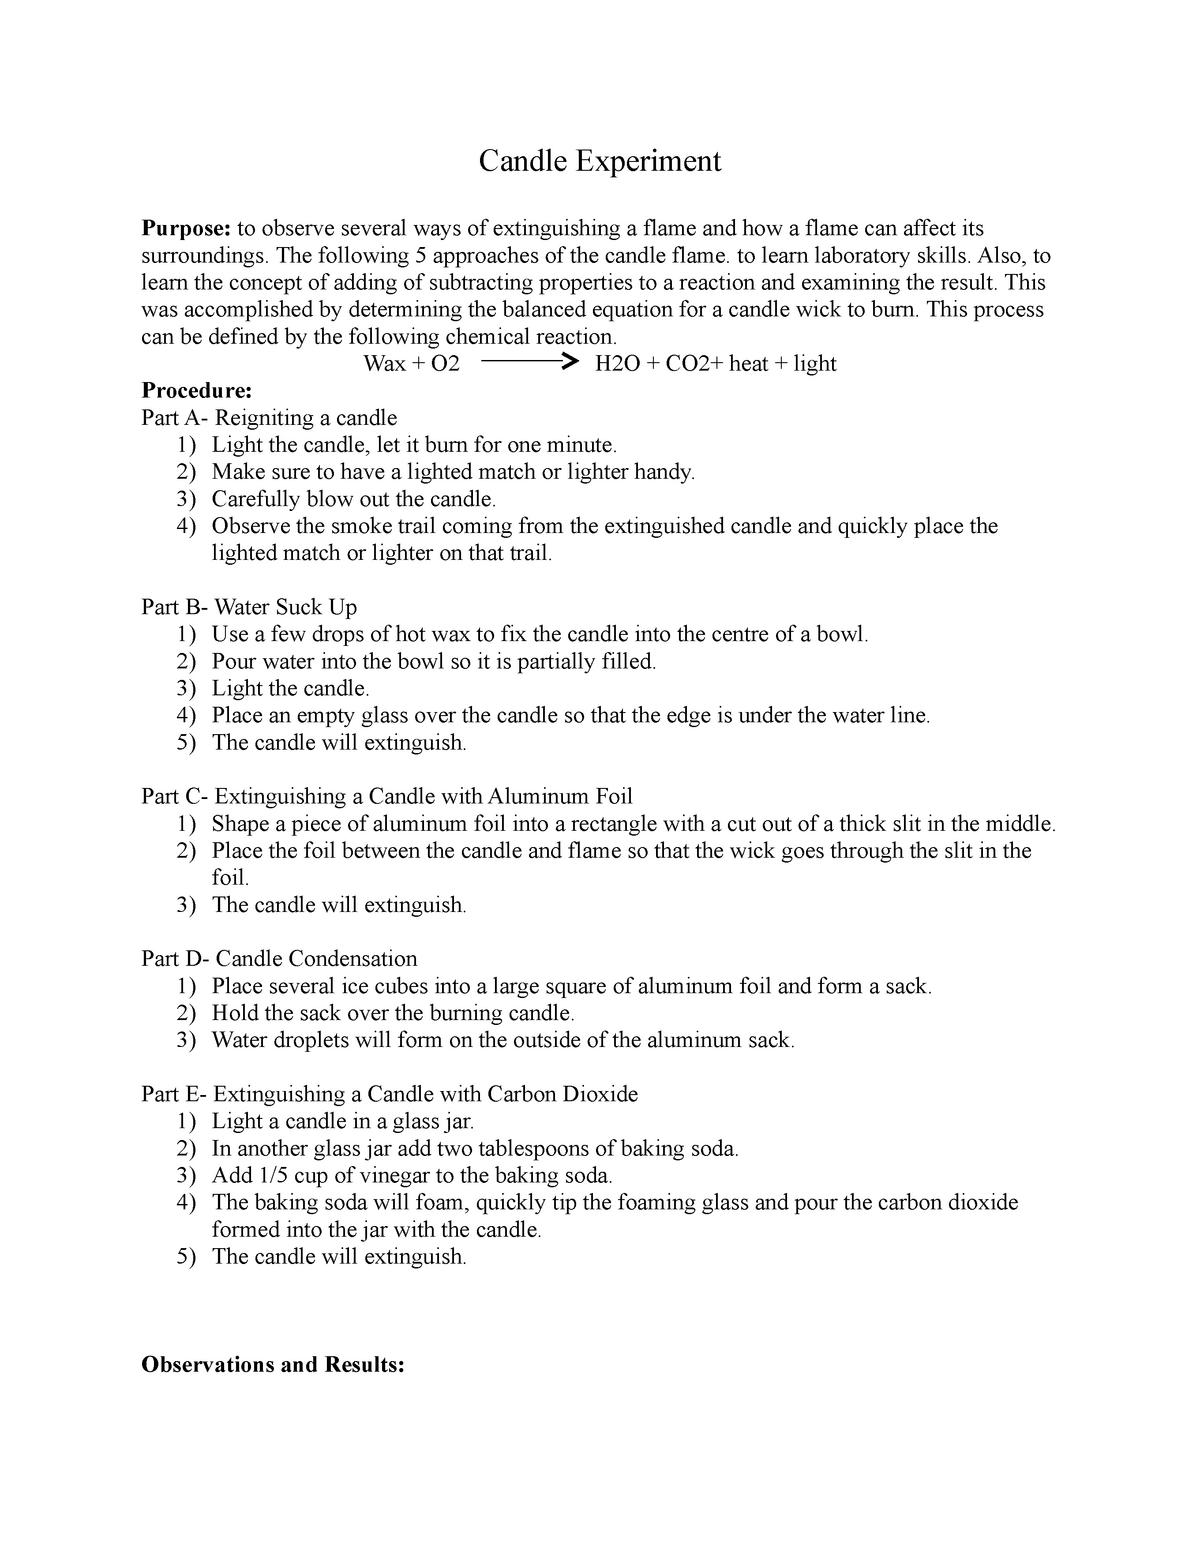 Candle experiment - Chem 217 Chemical Principles I - AU